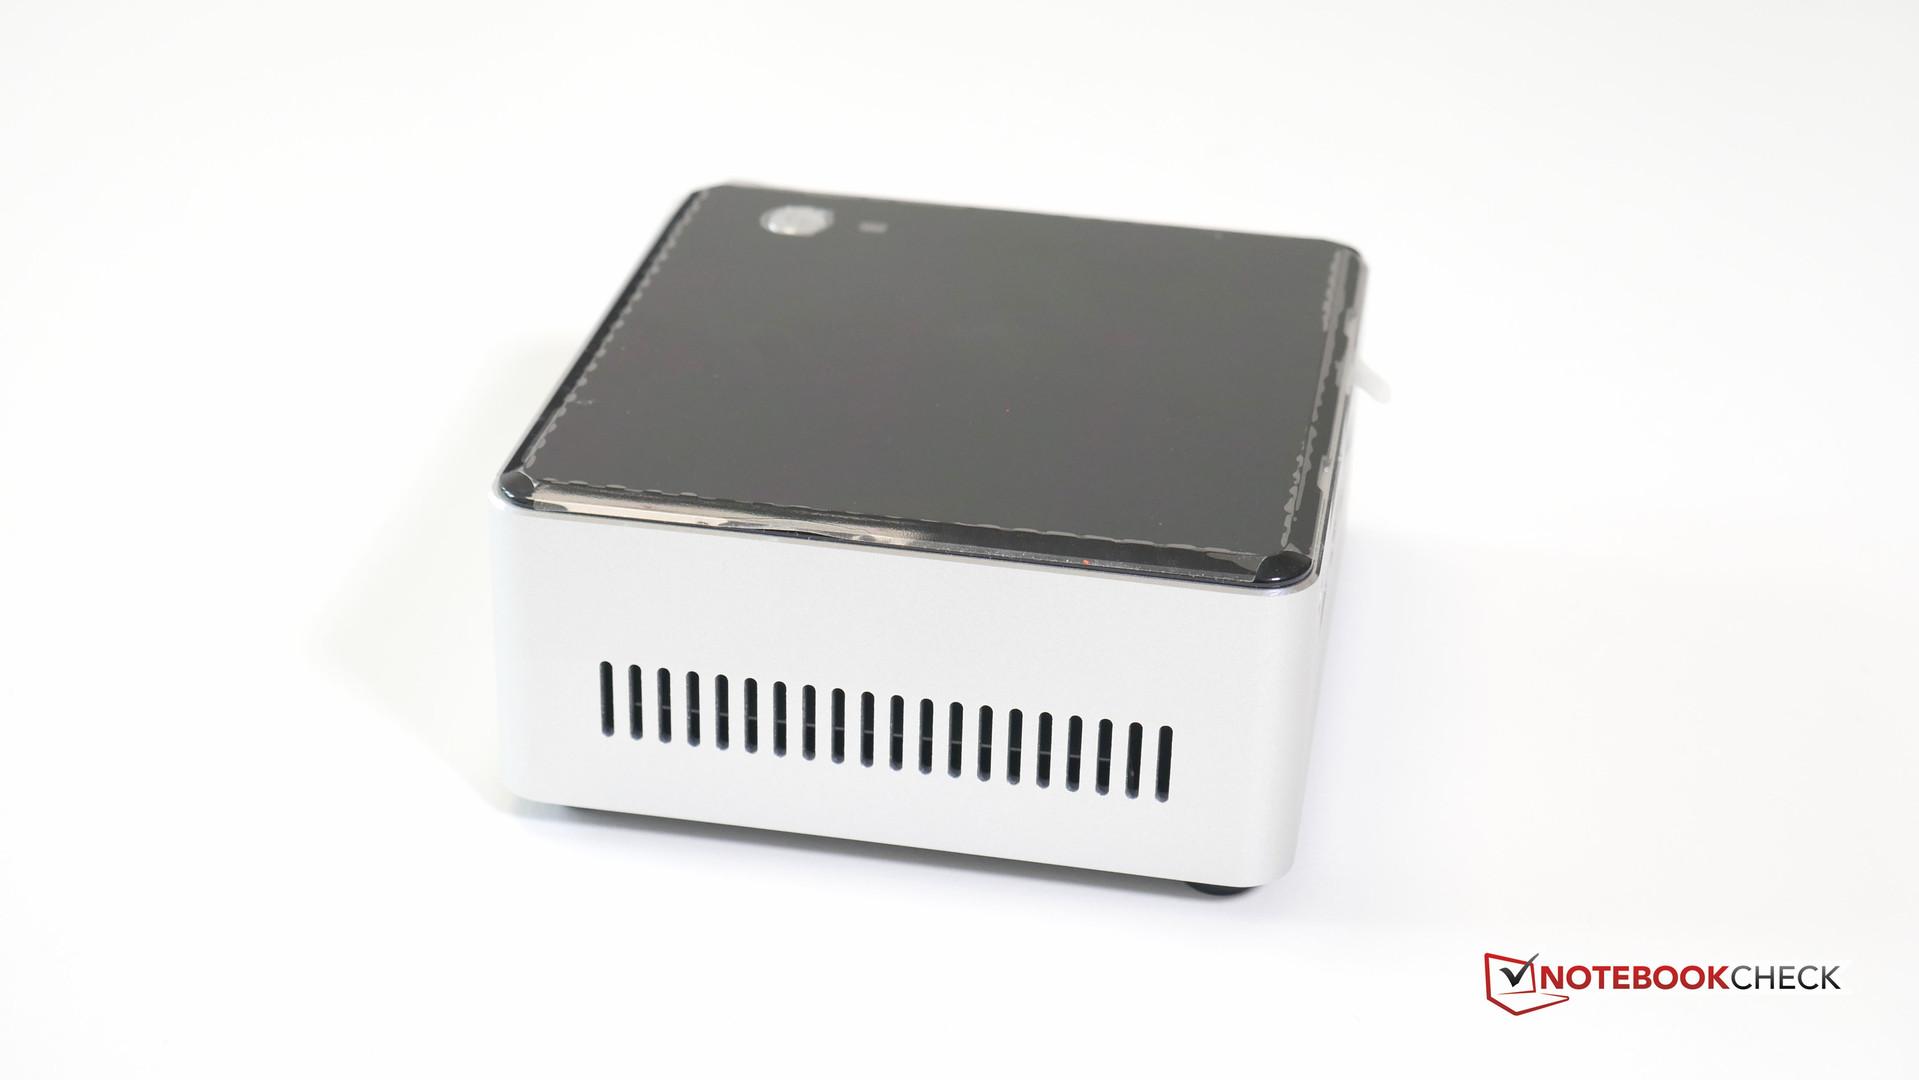 Intel Nuc6i5syh Mini Pc Review Reviews Flashdisk V Gen Astro 64 Gb 20 Original